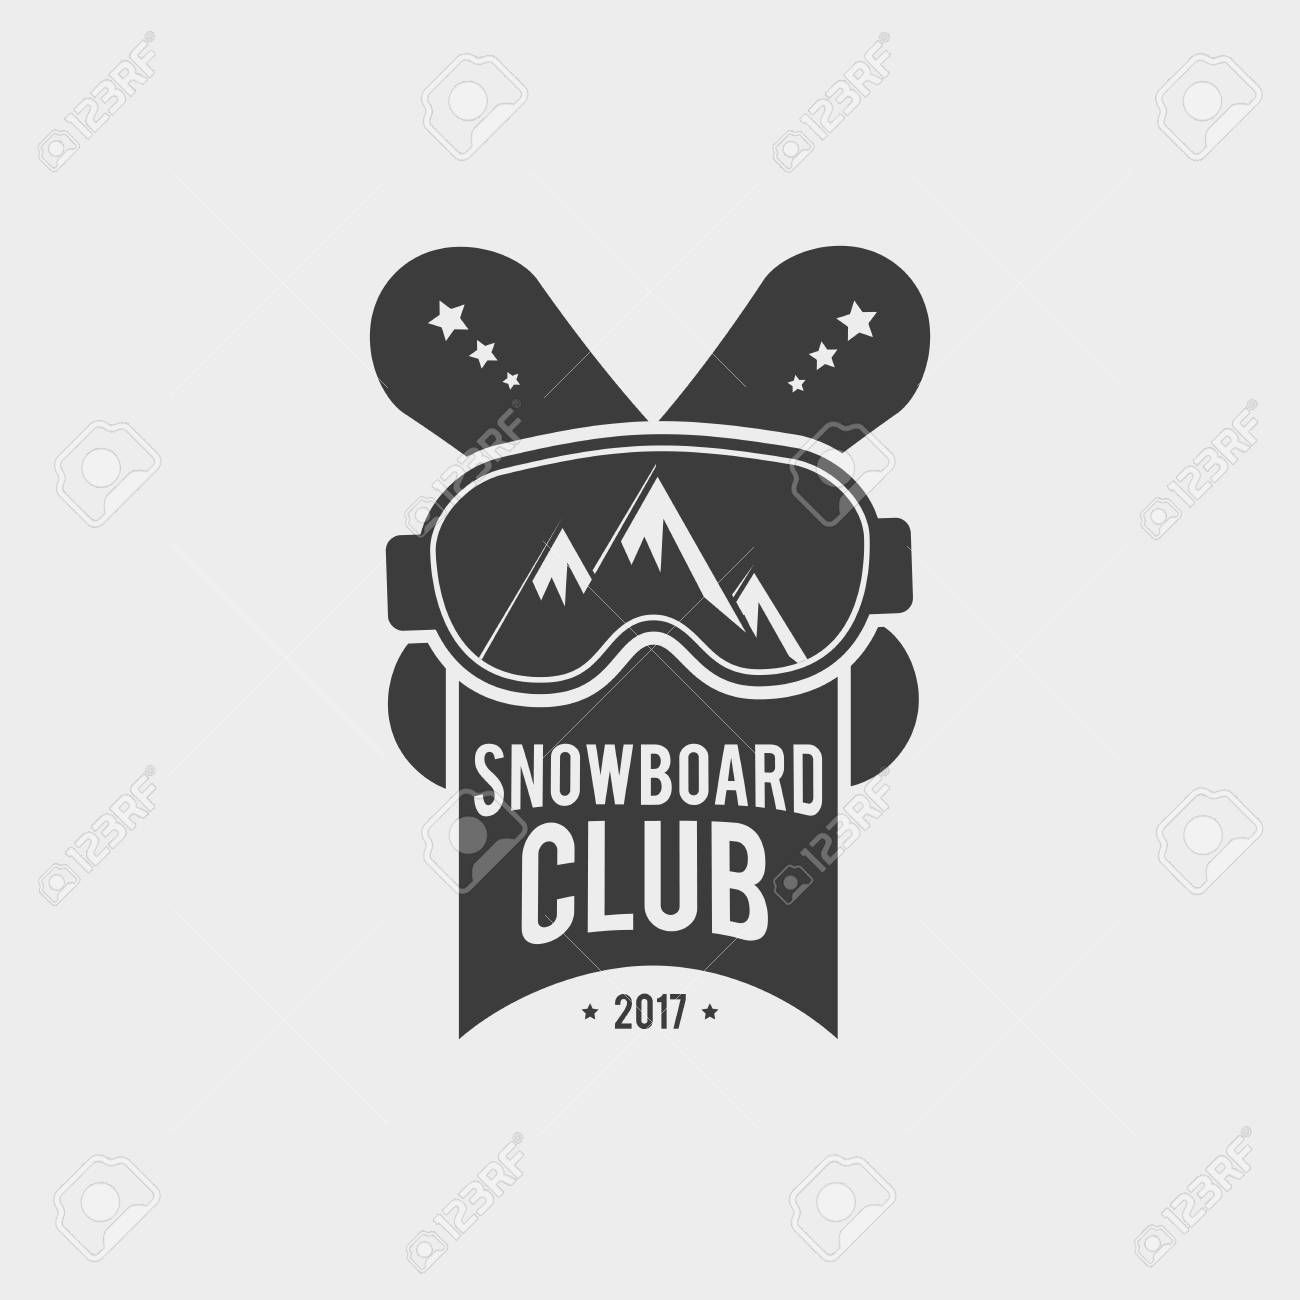 Snowboard Club Logo Vector Illustration Illustration Ad Logo Club Snowboard Illustration Illustration Hand Lettering Vector Logo Illustration